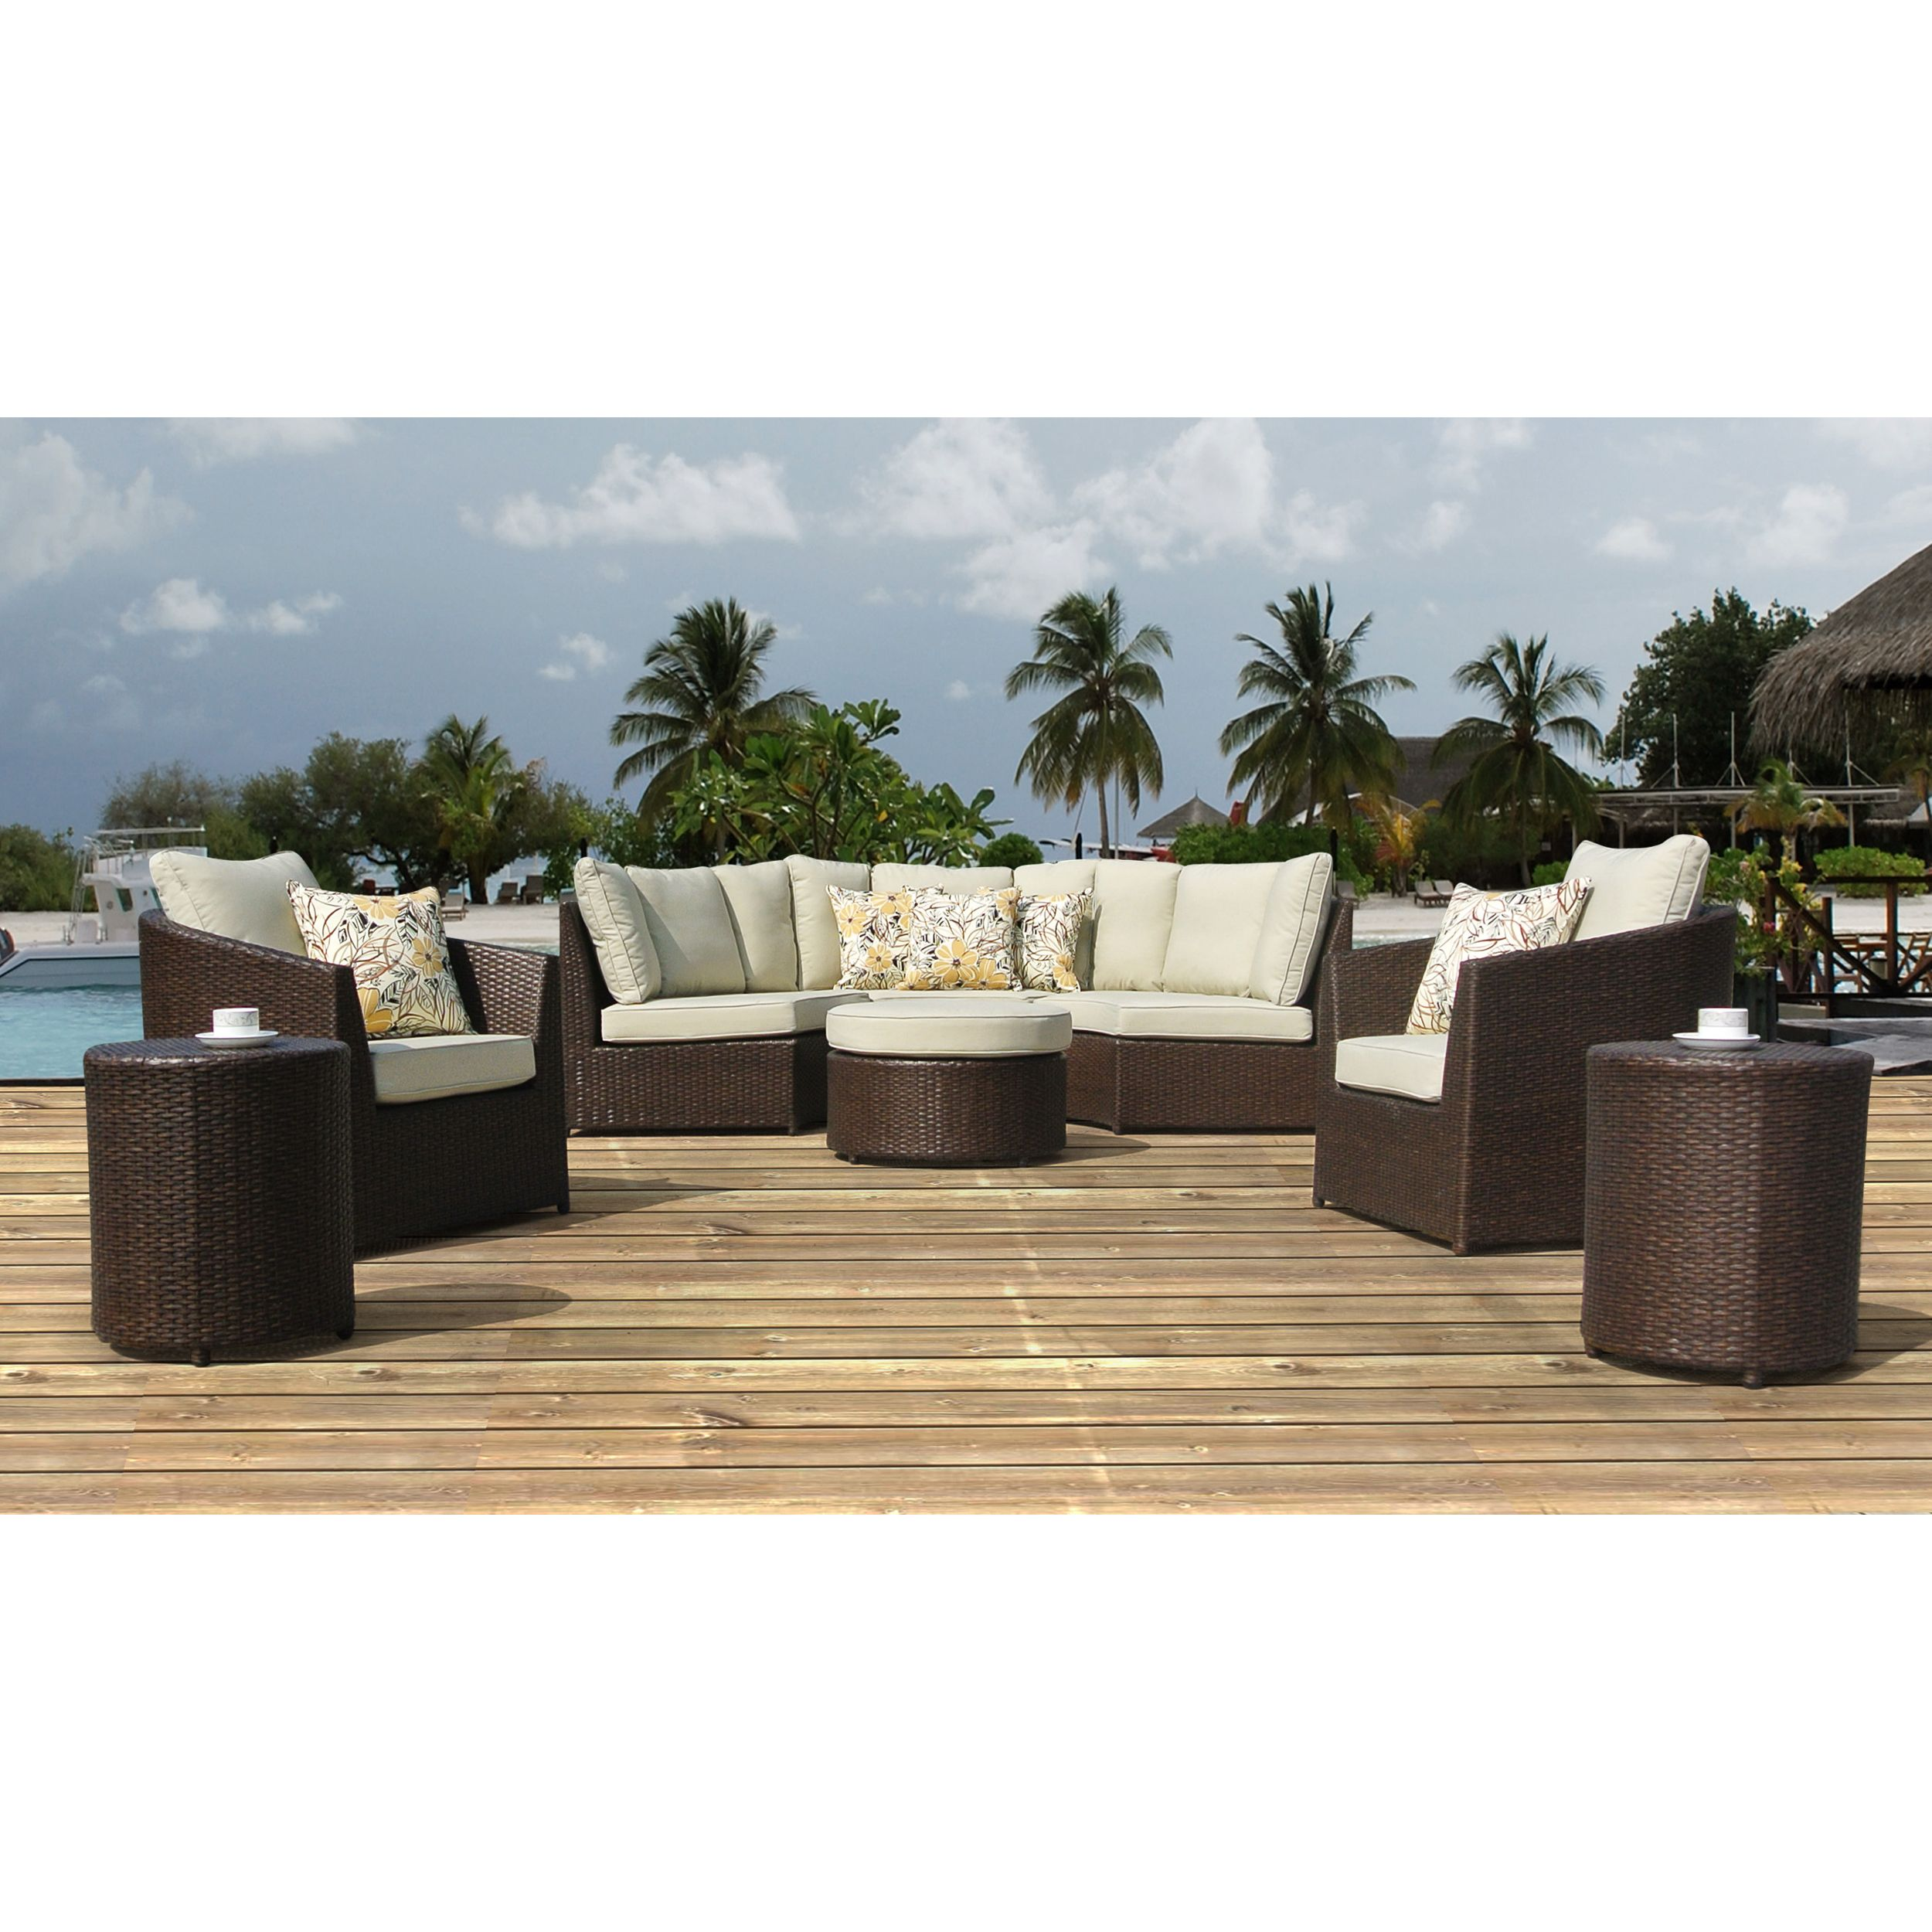 Superior Corvus Melrose Outdoor 8 Piece Brown Wicker Sofa Set By Corvus